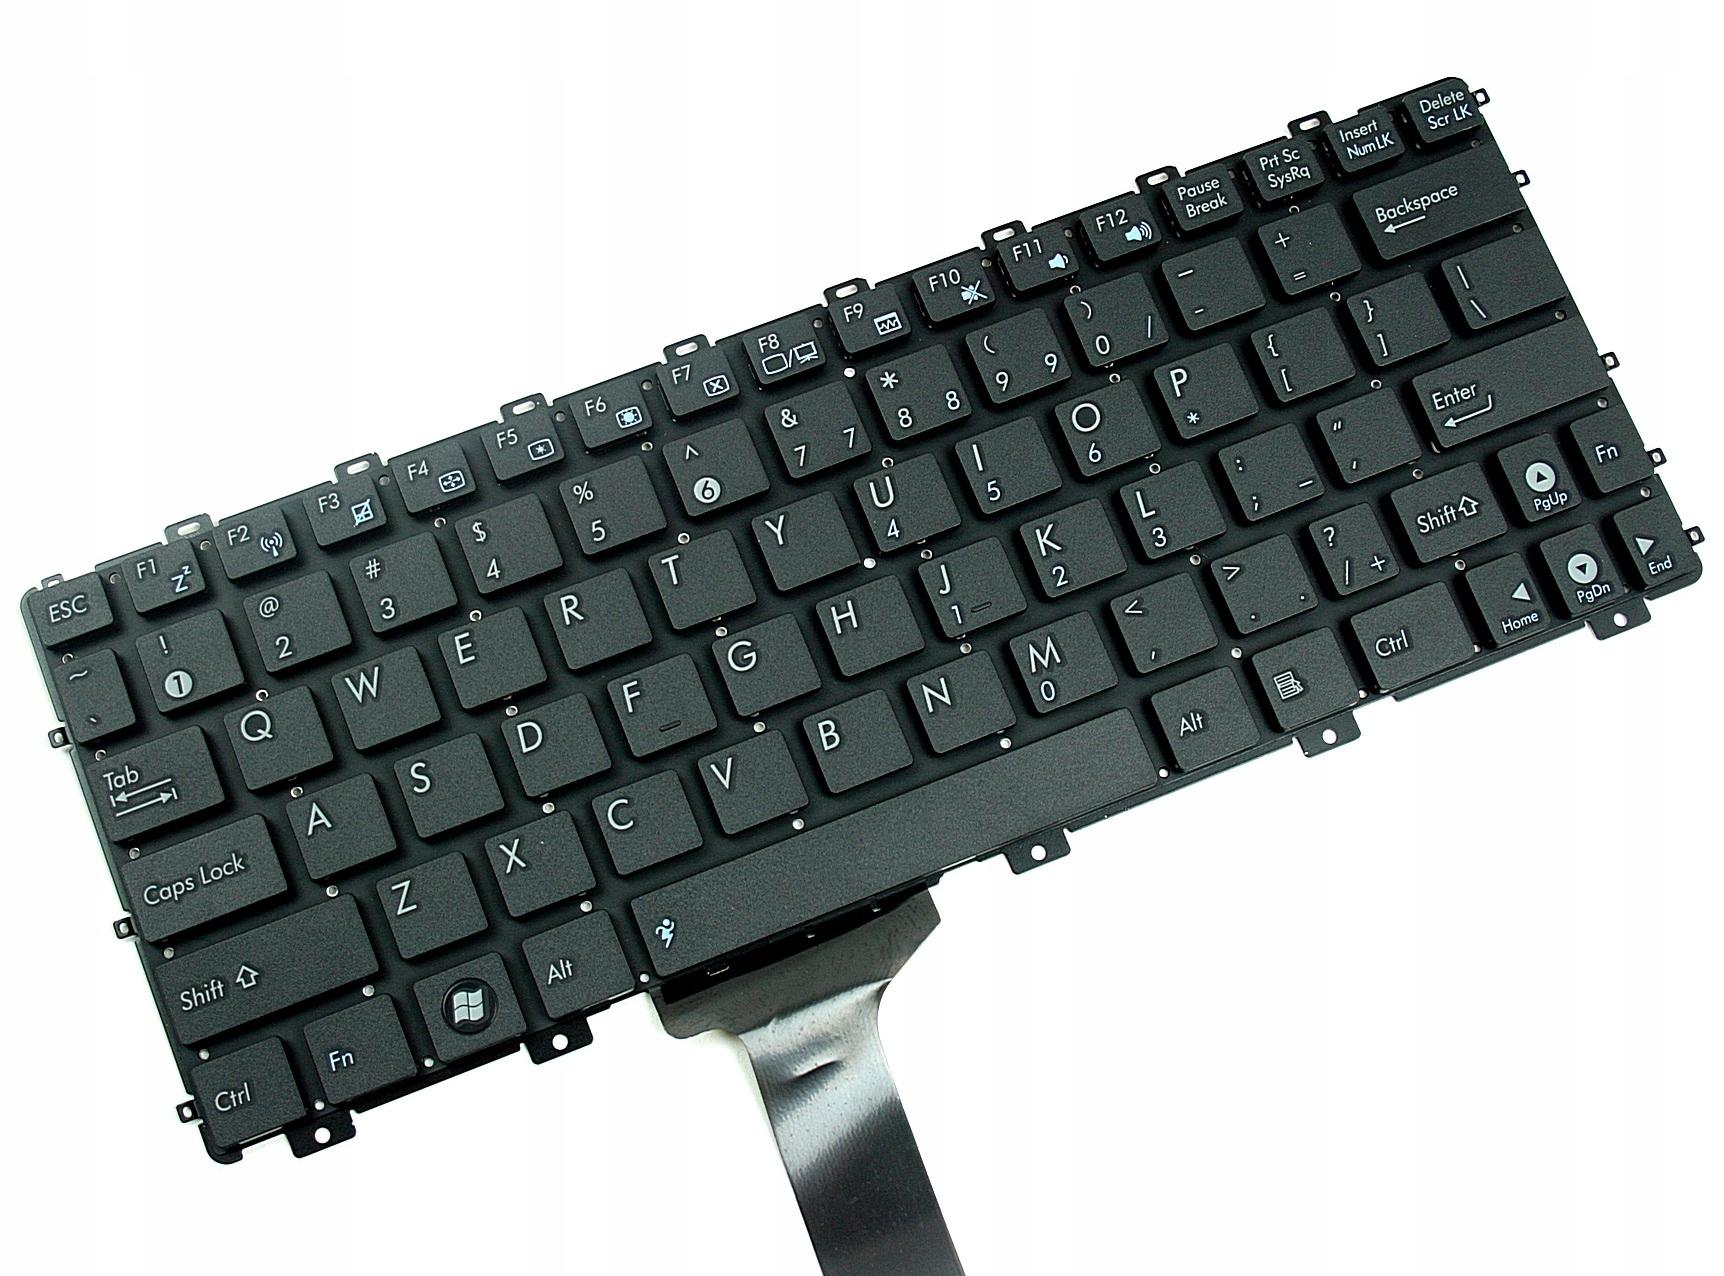 KLAWIATURA ASUS EEE PC 1015 1015PED 1015PB 1011PX - Klawiatury do laptopów